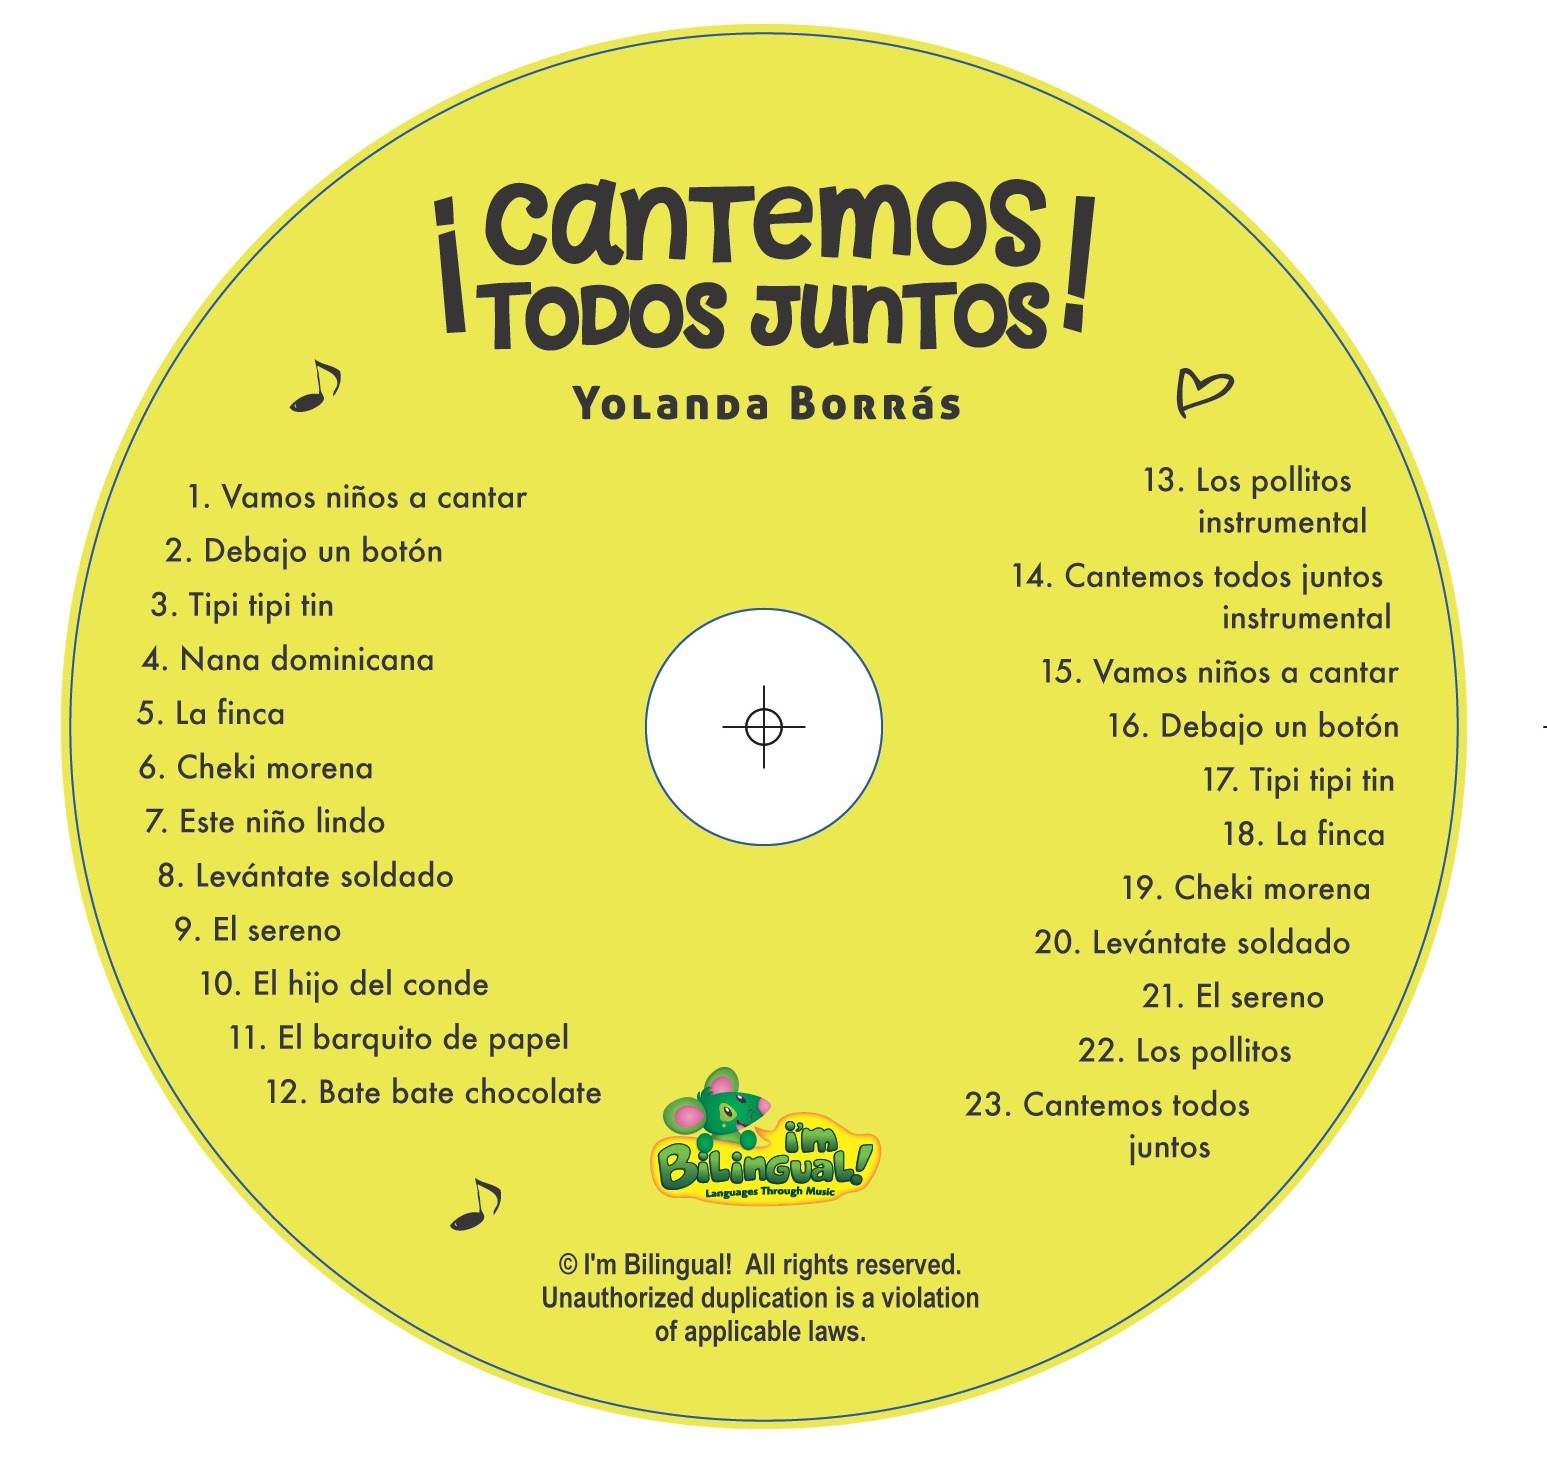 Â¡Cantemos_todos_juntos!_inside_CD_desig